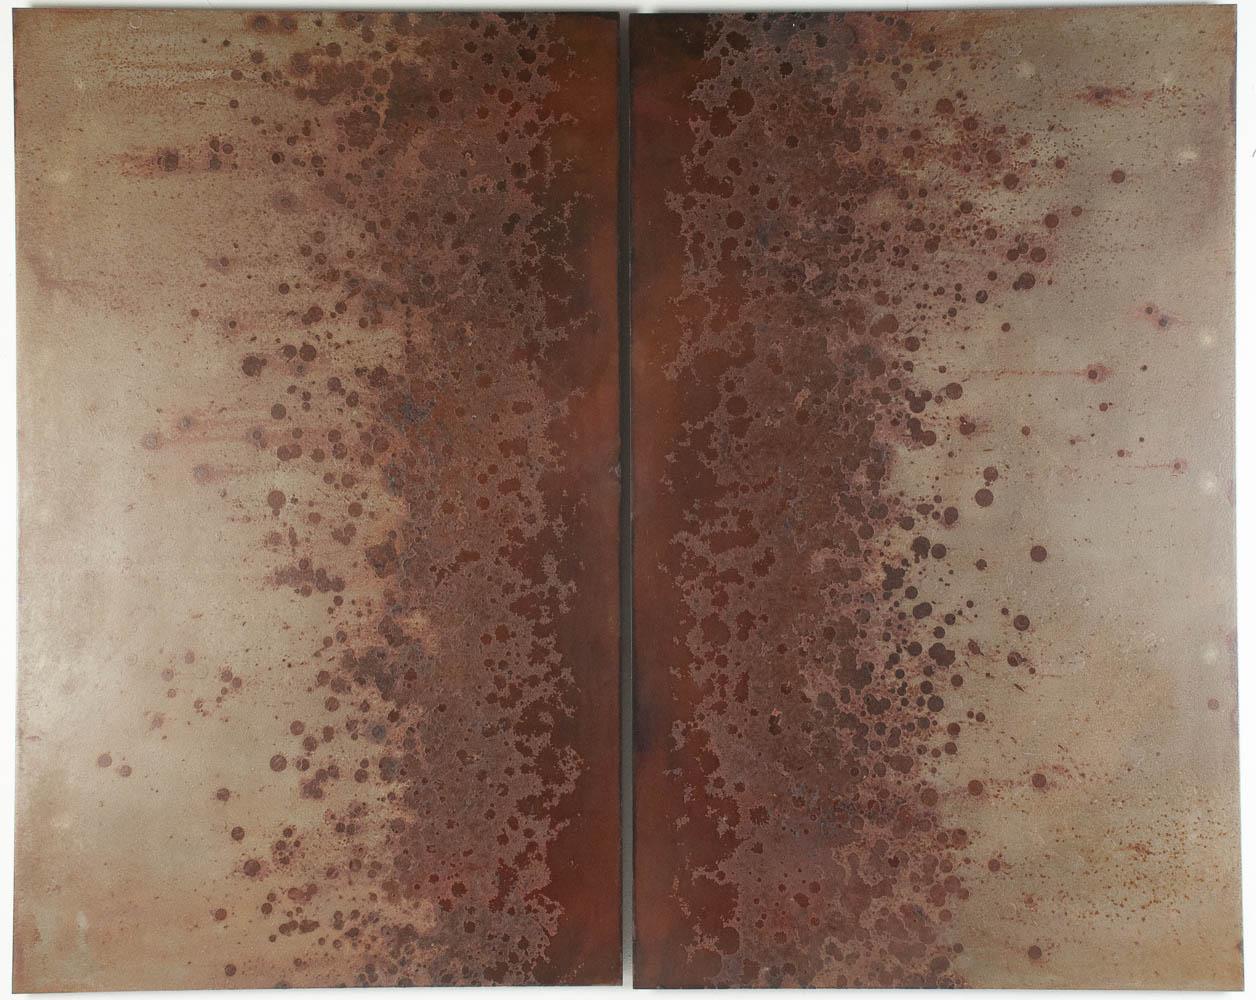 "Iron Bloom (Trail). 2014. Steel, iron oxide. 30 x 37½"". Darrin Hallowell"